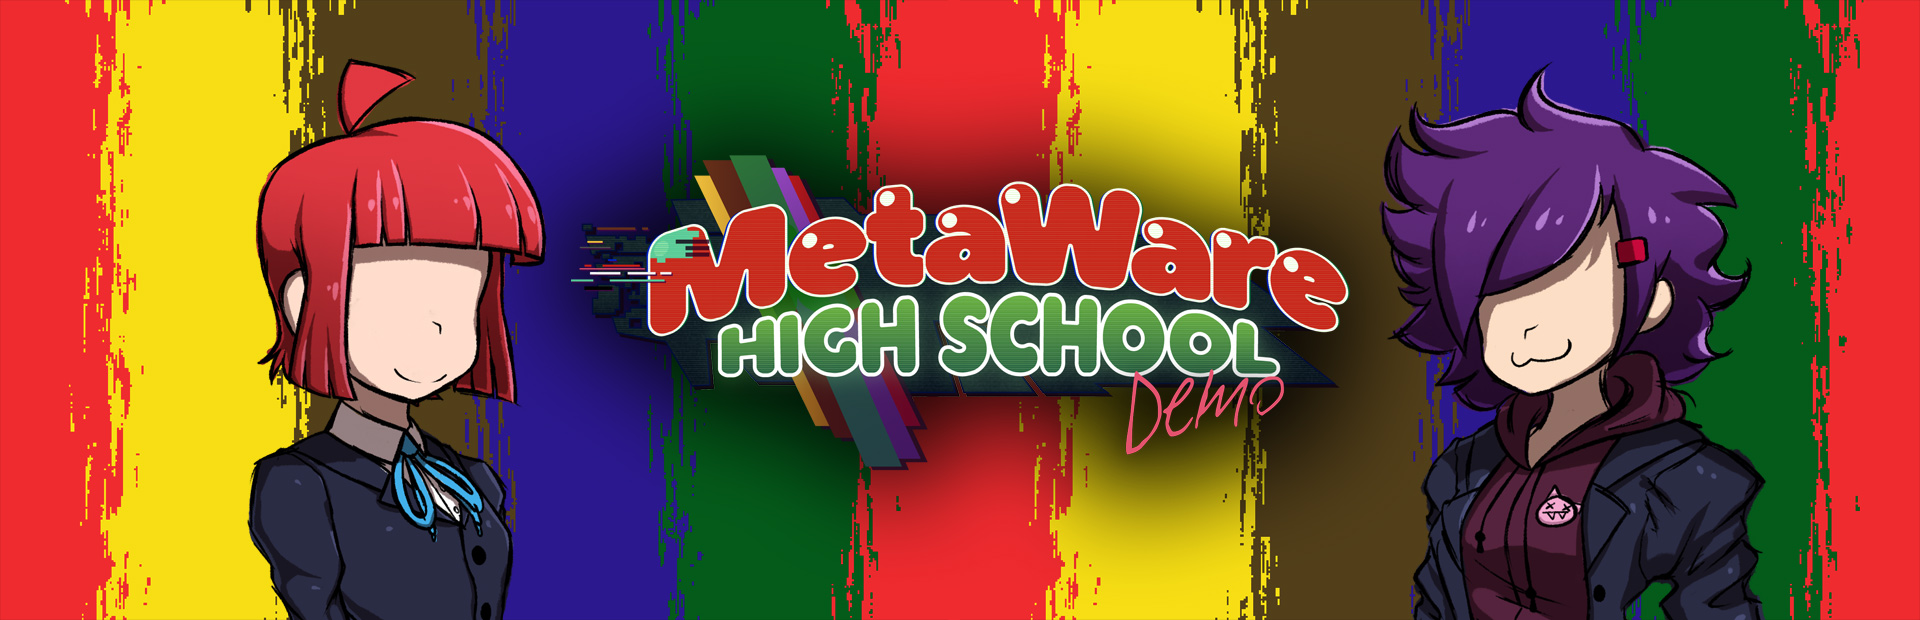 MetaWare High School (Demo)